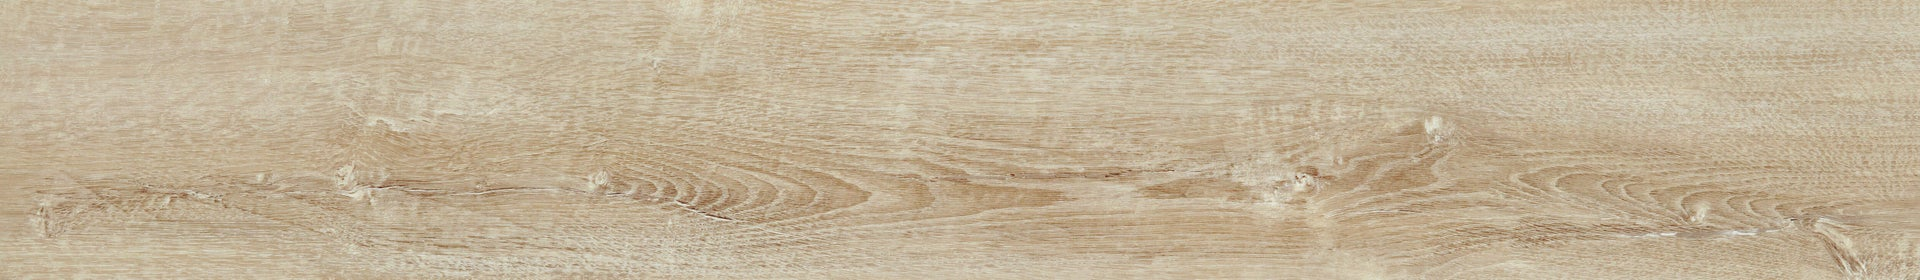 Pavimento PVC adesivo Senso Baladlight Sp 2.5 mm beige - 5